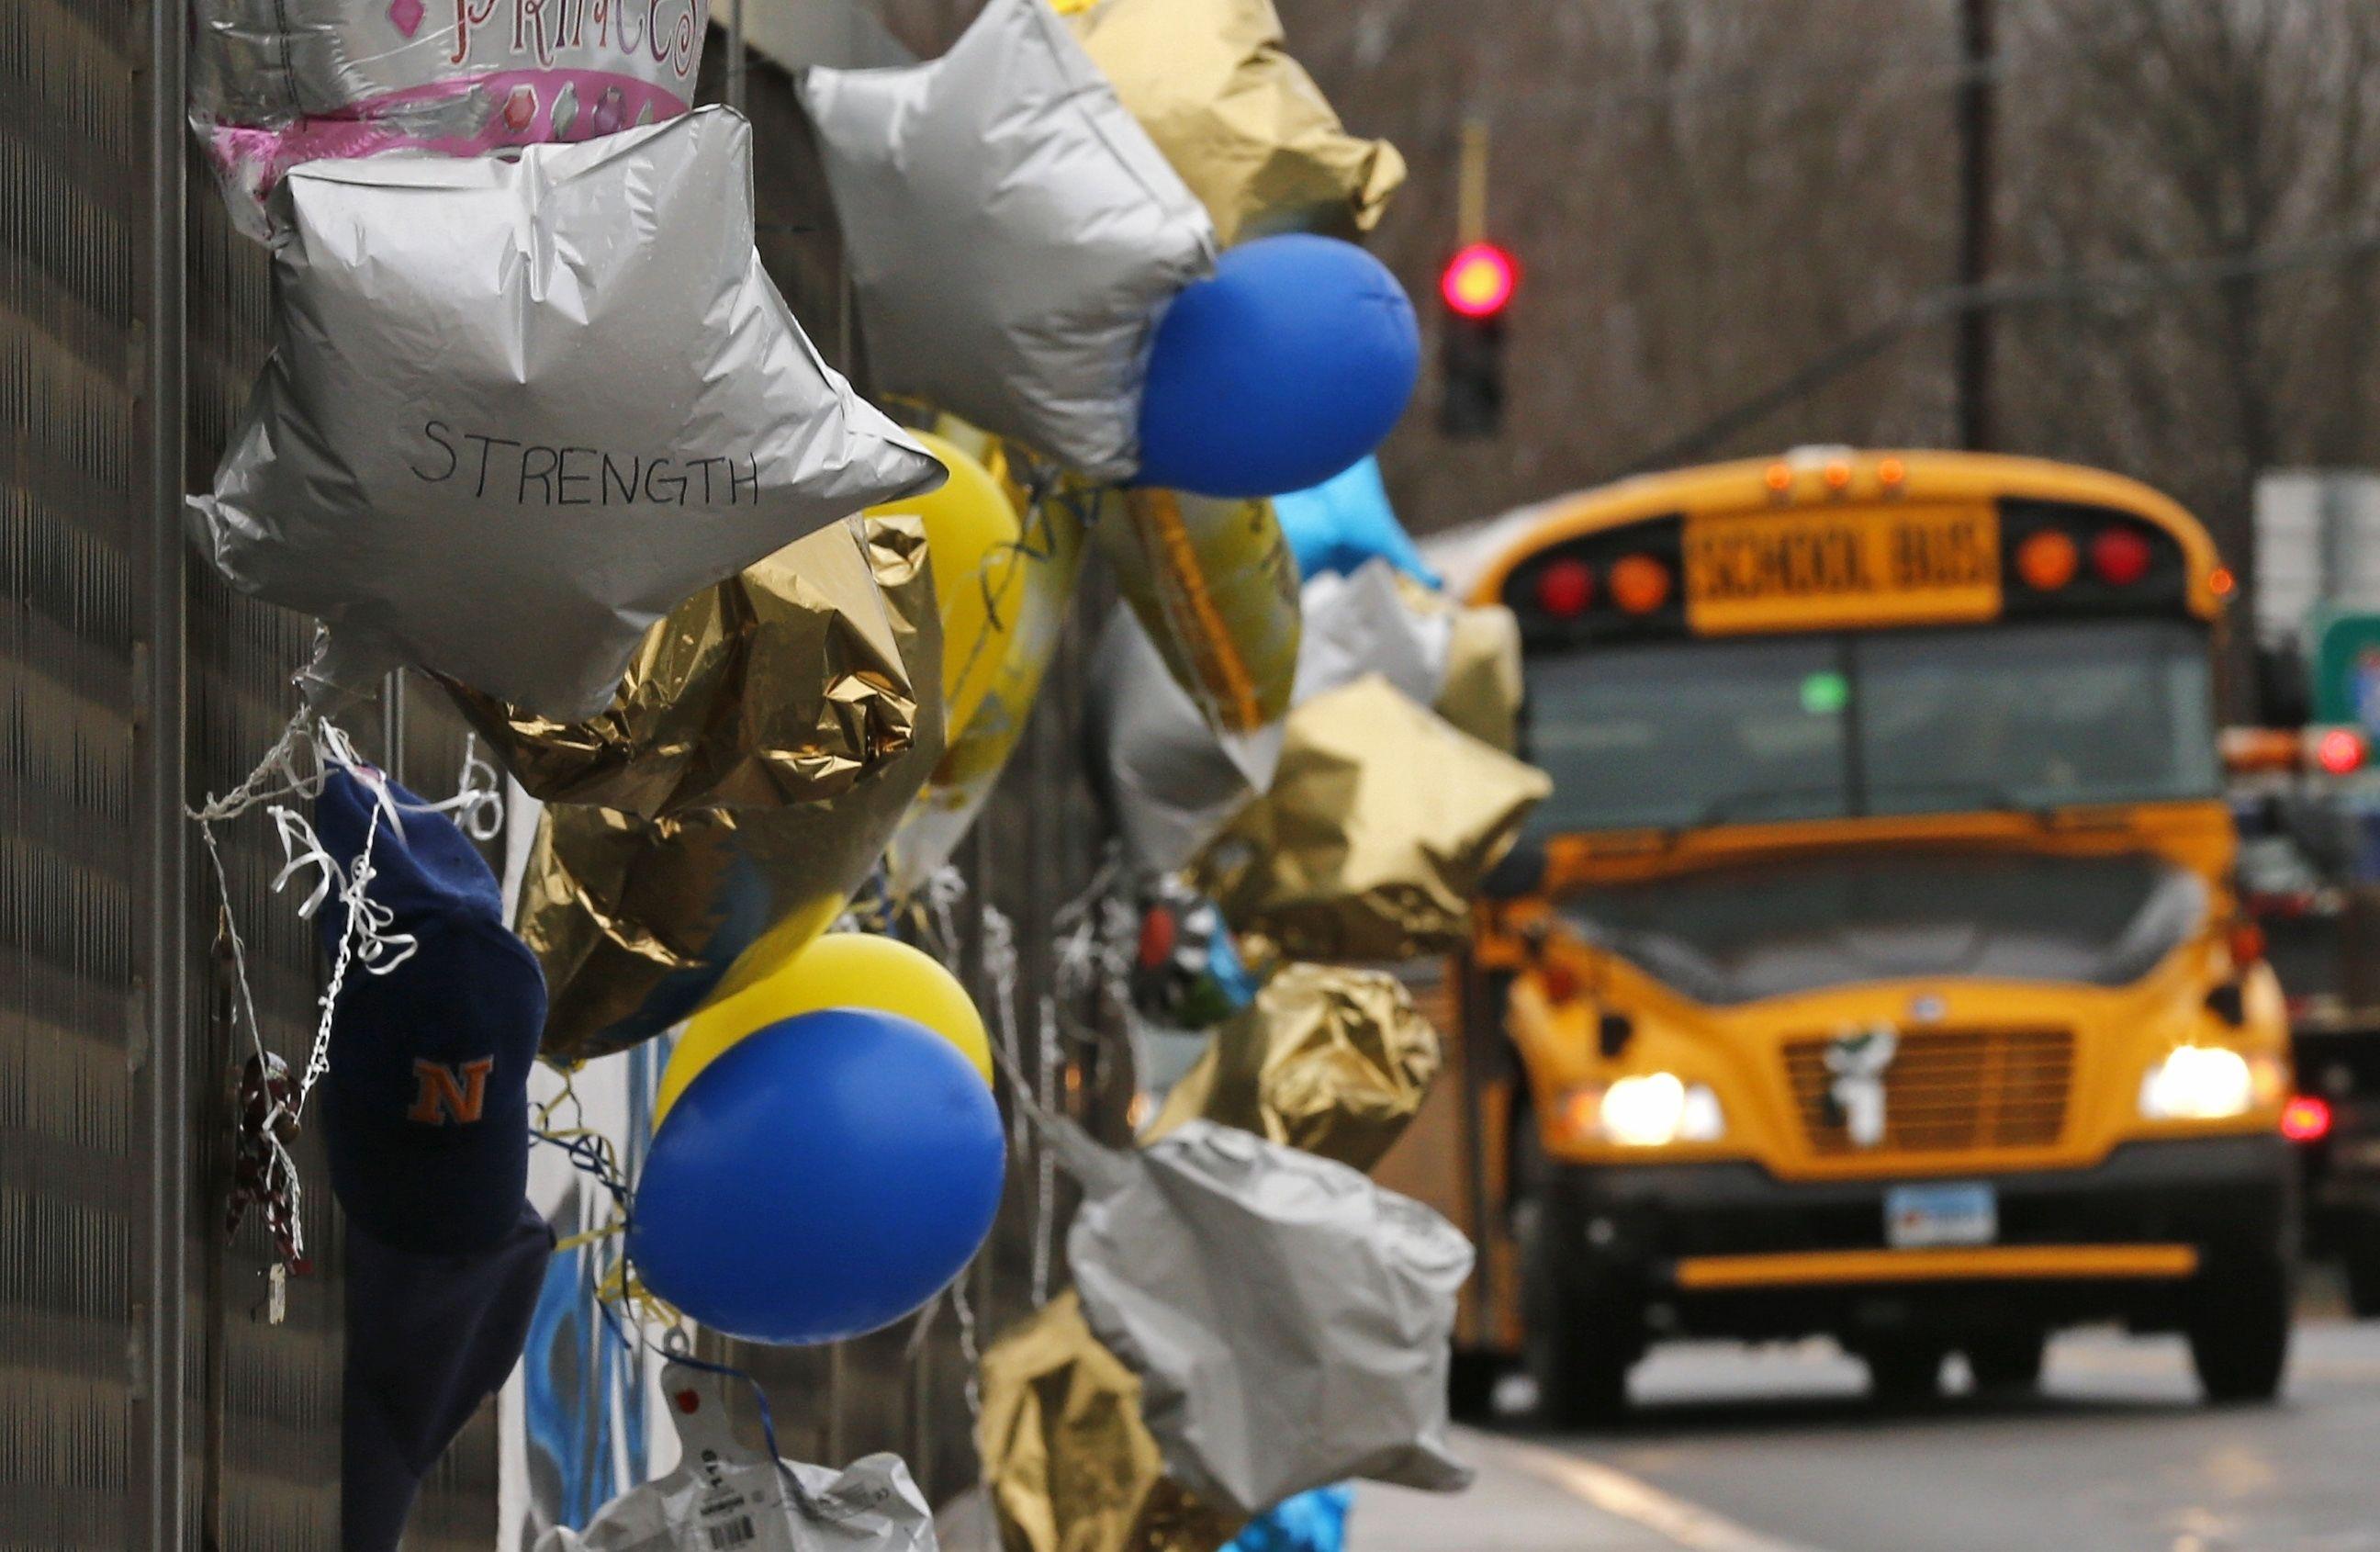 Protect Children Not Guns School psychology resources